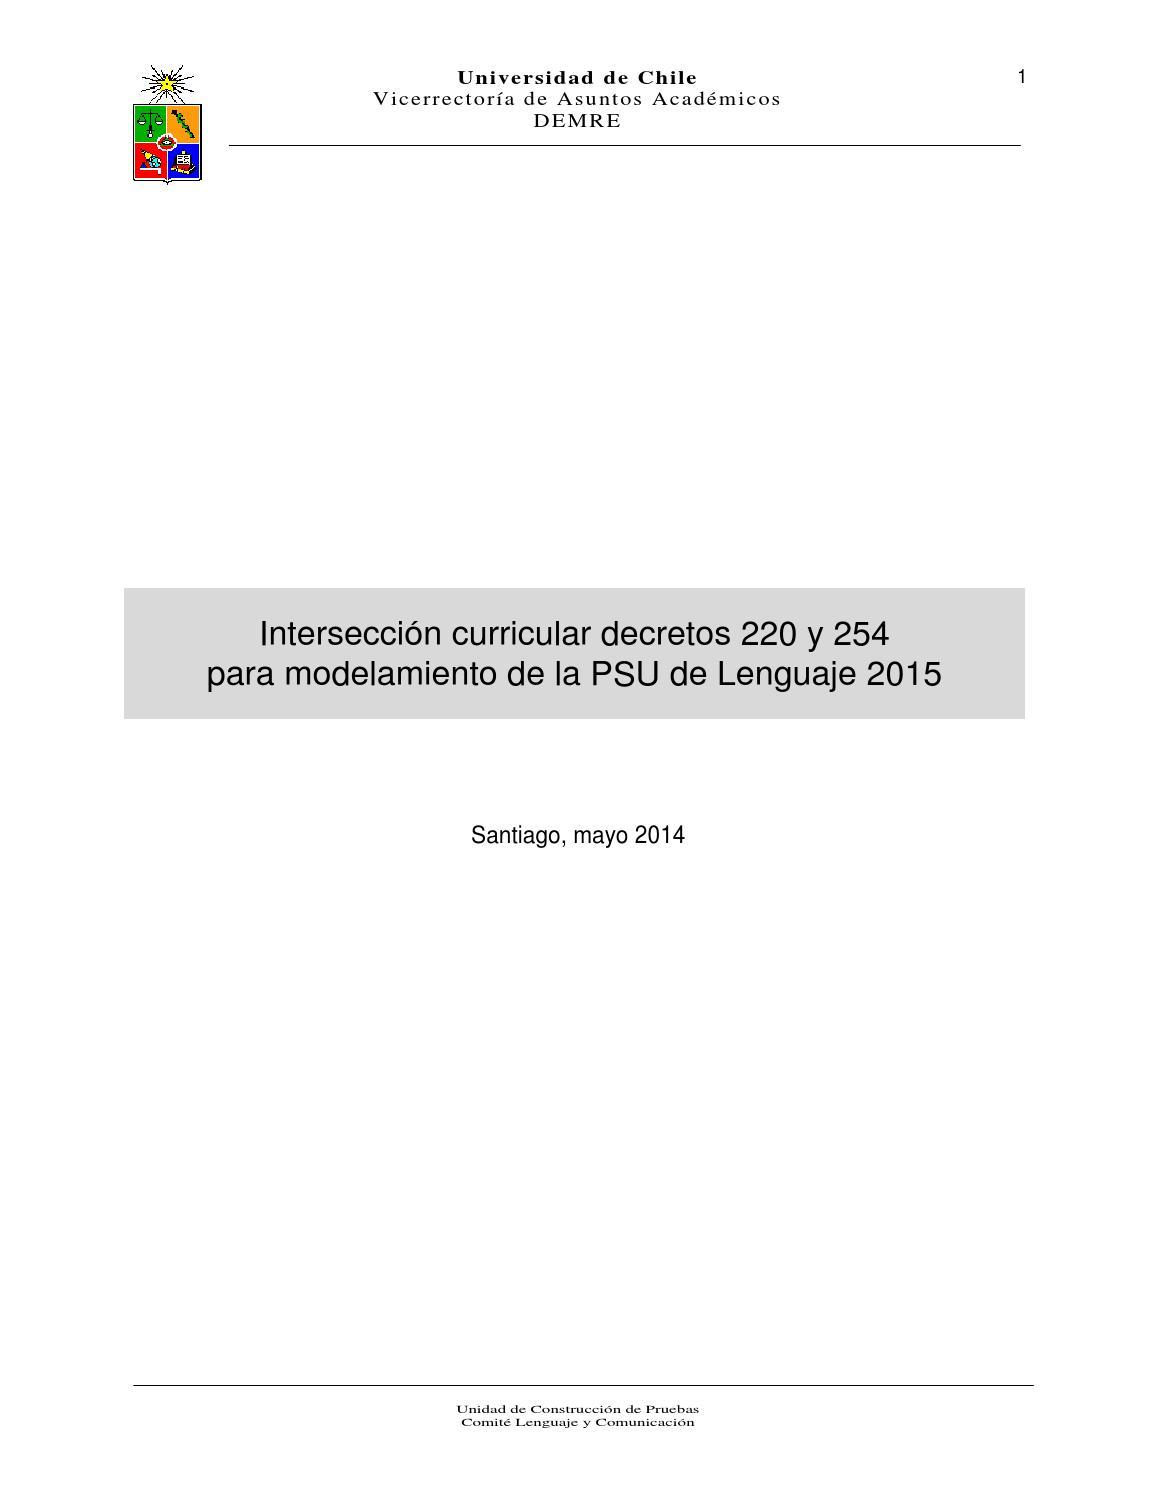 Lyc interseccion curricular p2015 by Ceia Educa - issuu